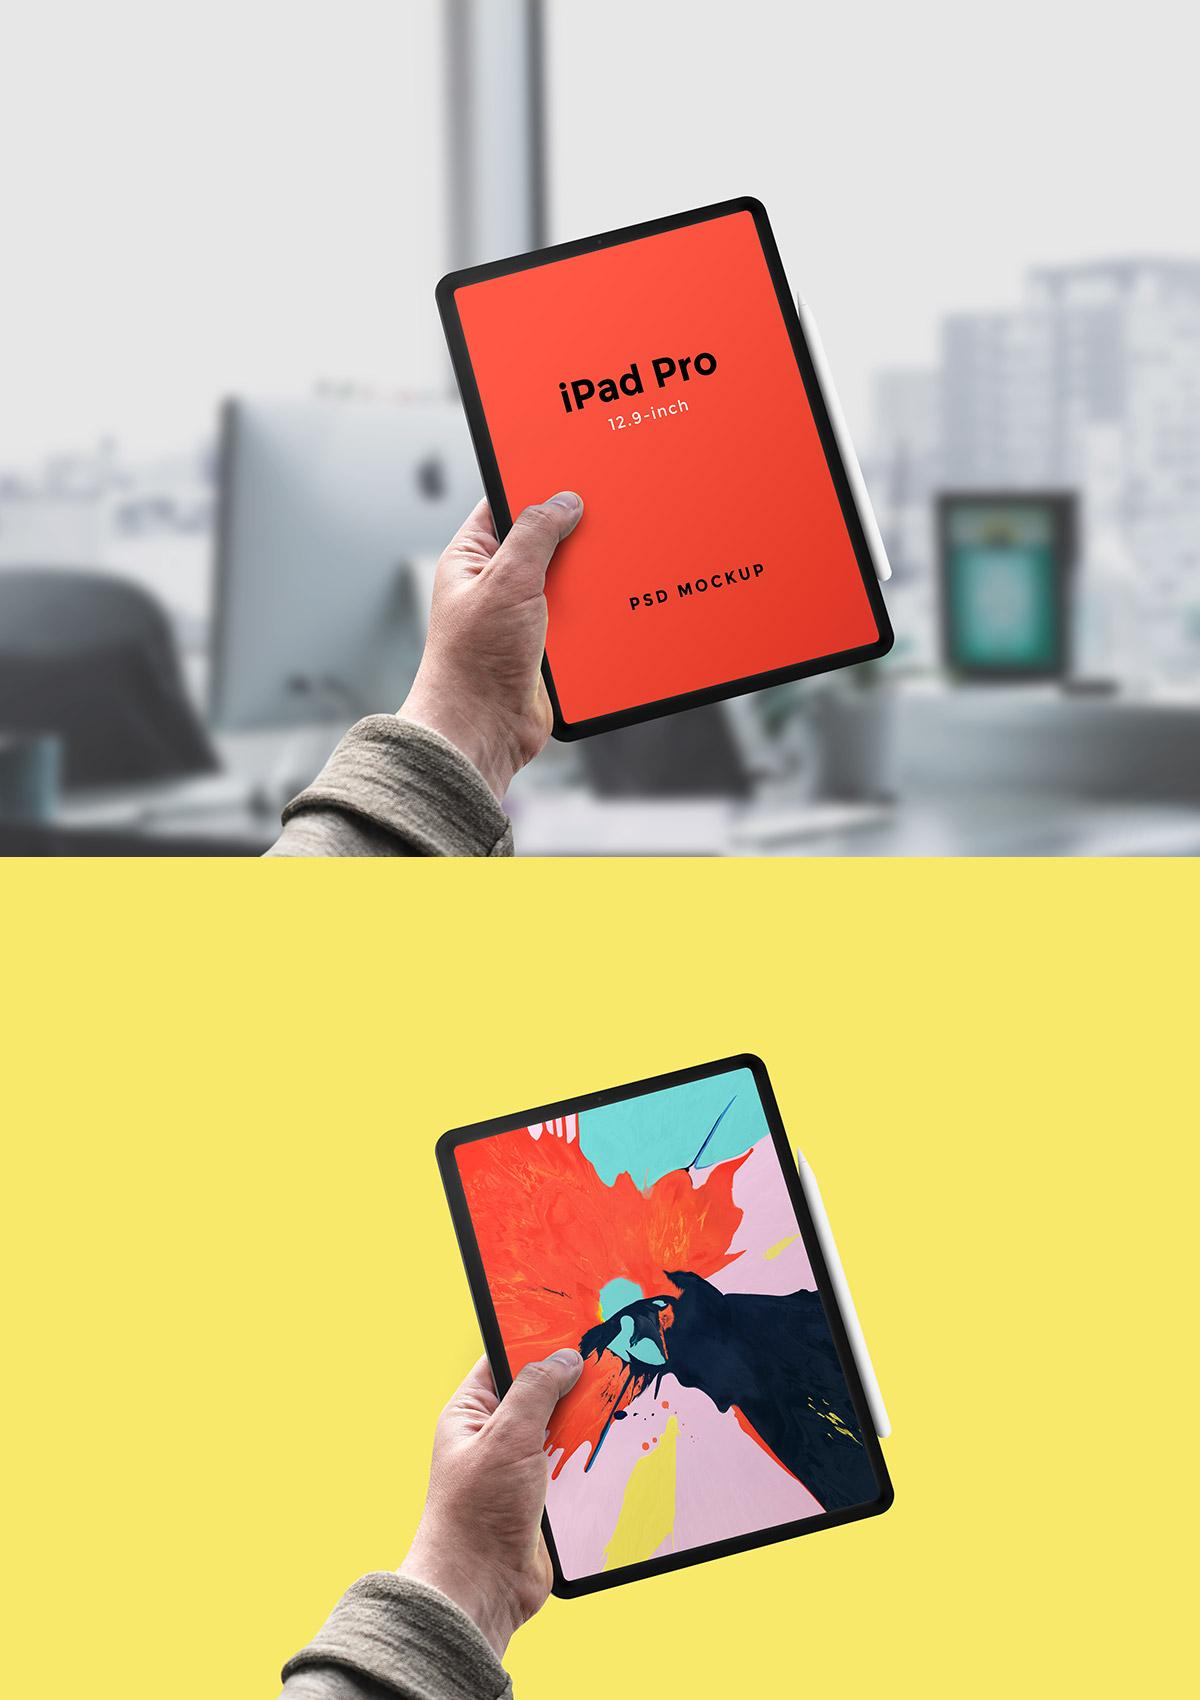 iPad Pro In Hand Mockup